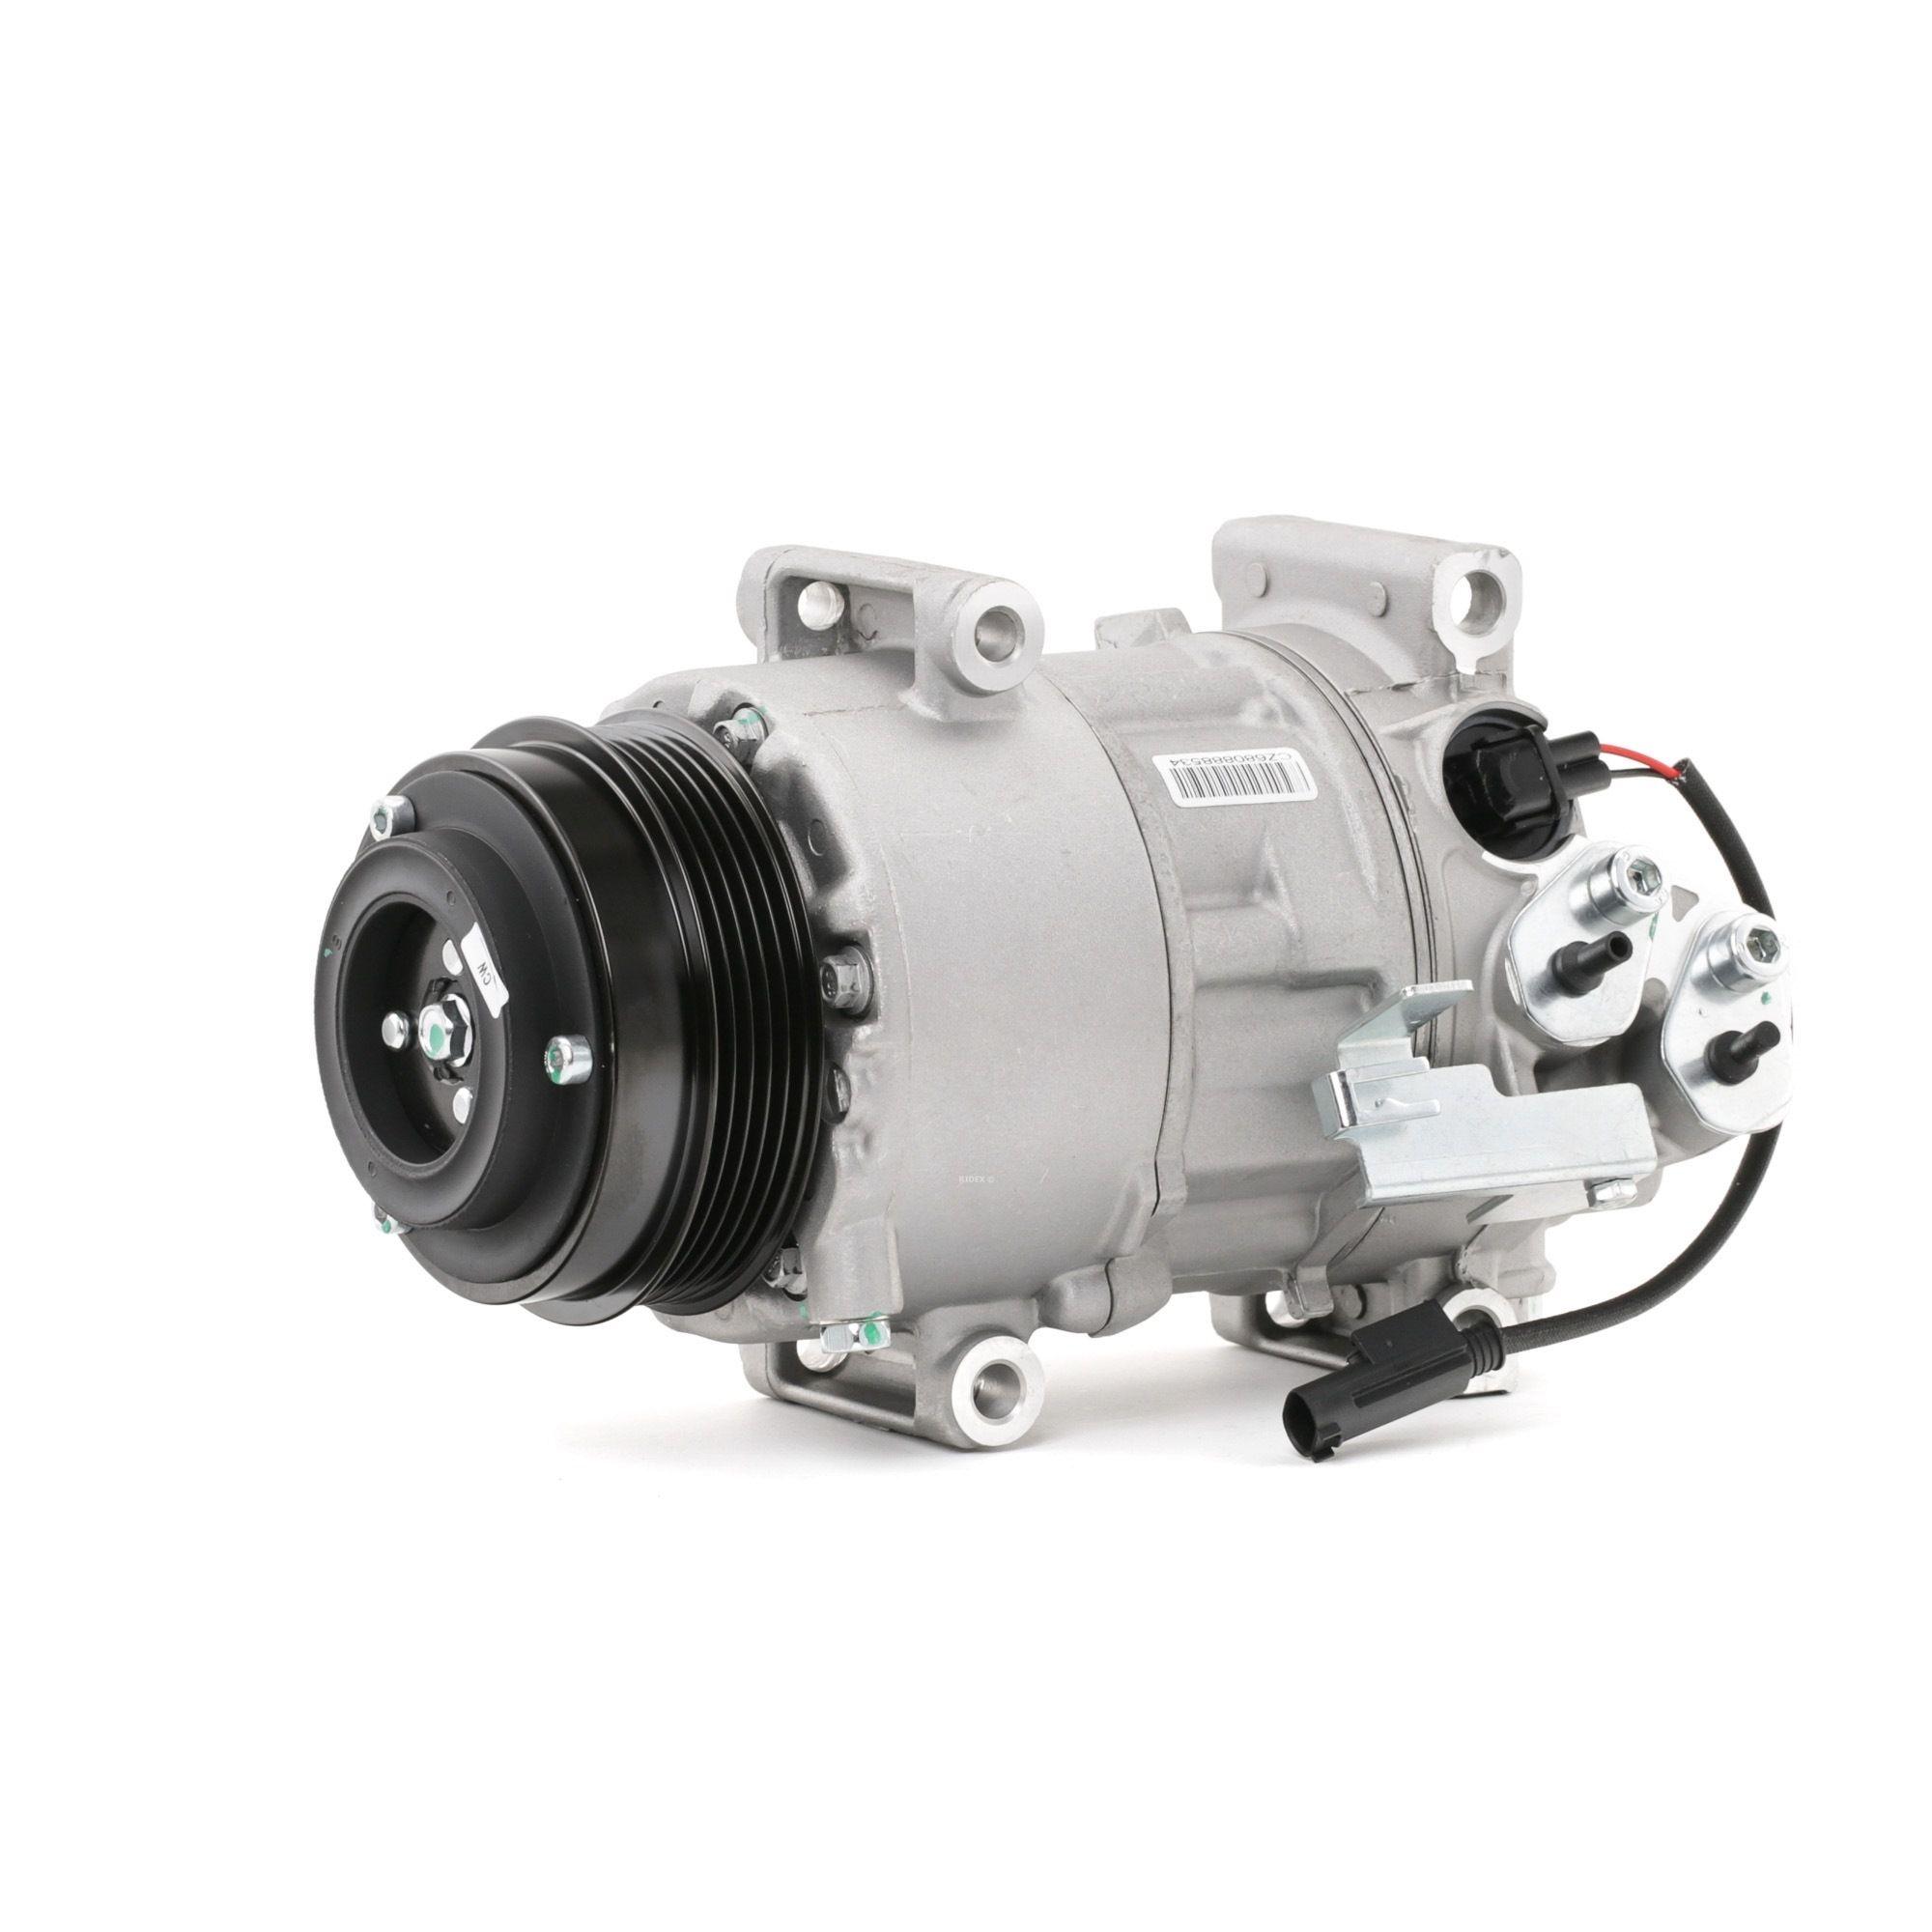 Original ALFA ROMEO Kompressor Klimaanlage 447K0092